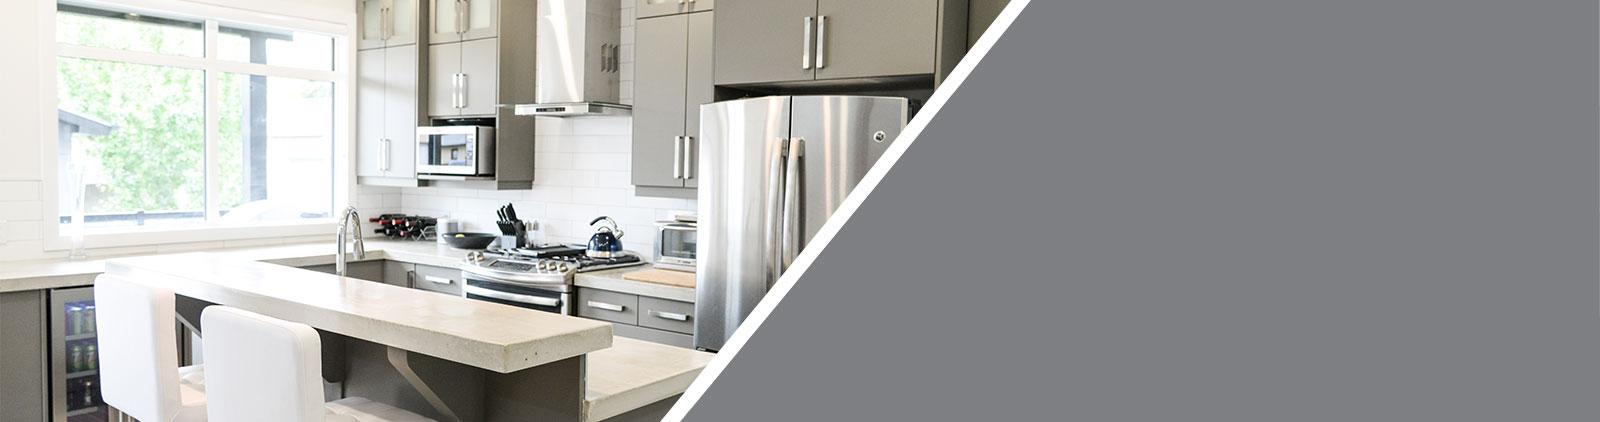 sleek-modern-edmonton-kitchen-renovation